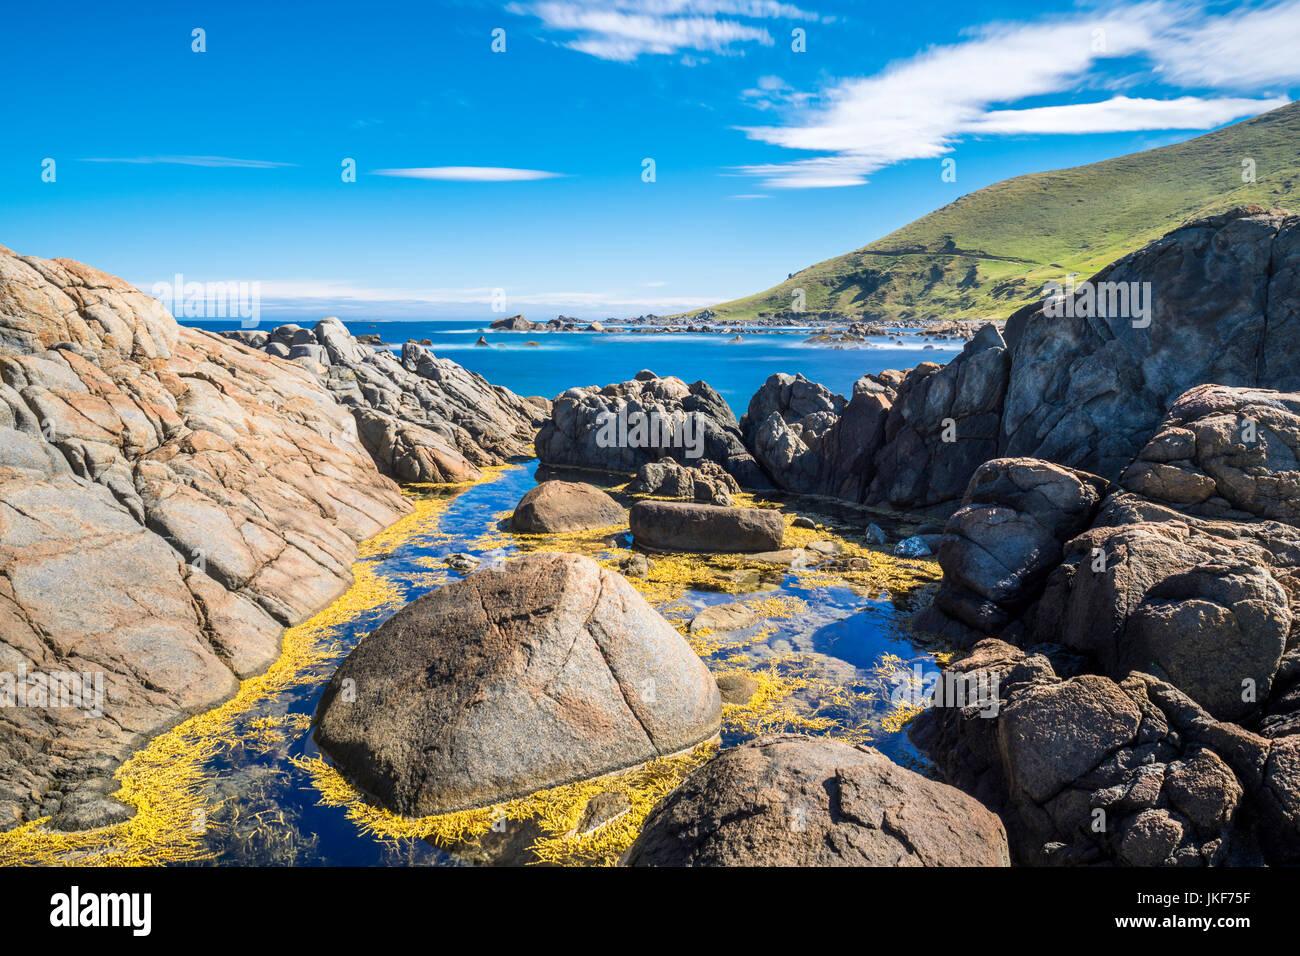 Neuseeland, Südinsel, Southern Scenic route, orepuki, gemütliche Essecke Strand Stockbild